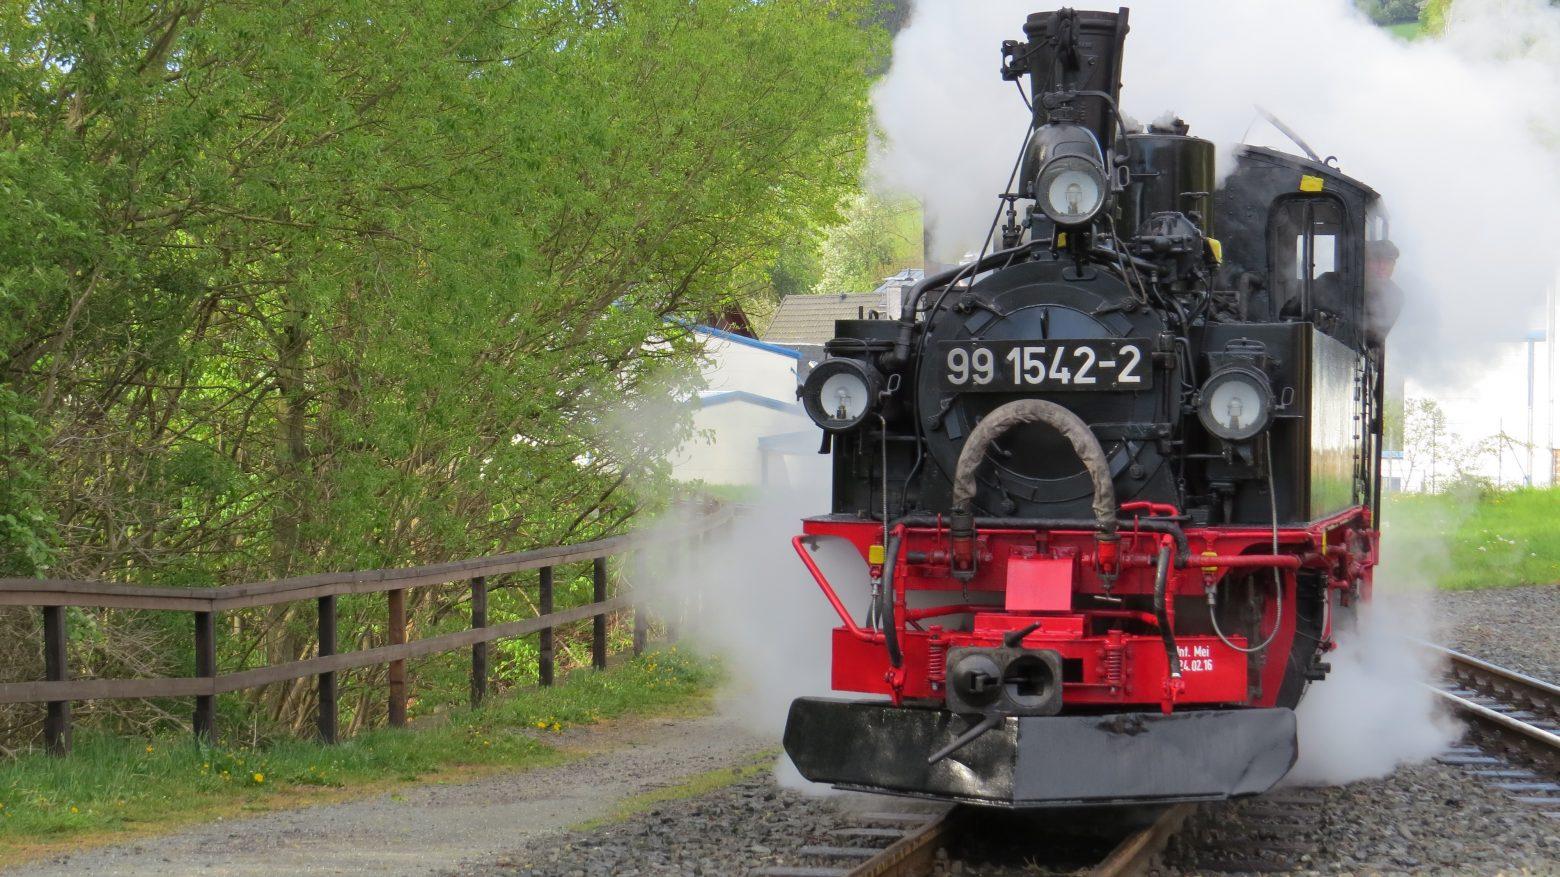 transport-system-3279725